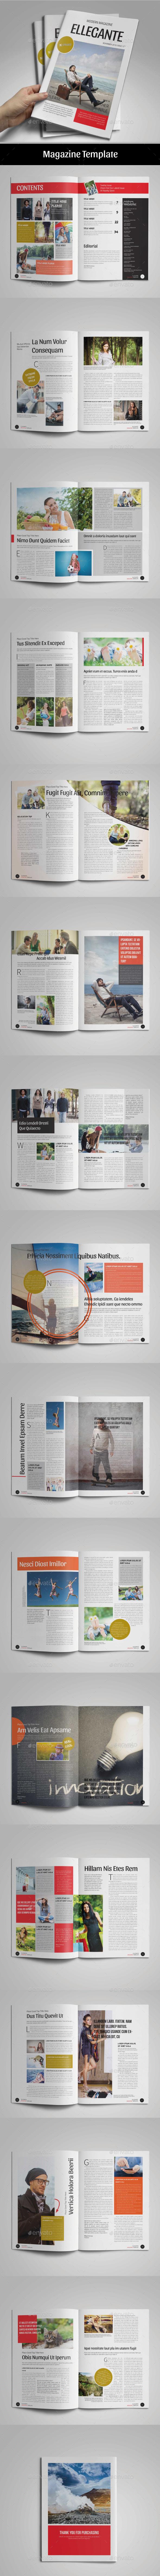 Ellegante Magazine Template - Magazines Print Templates